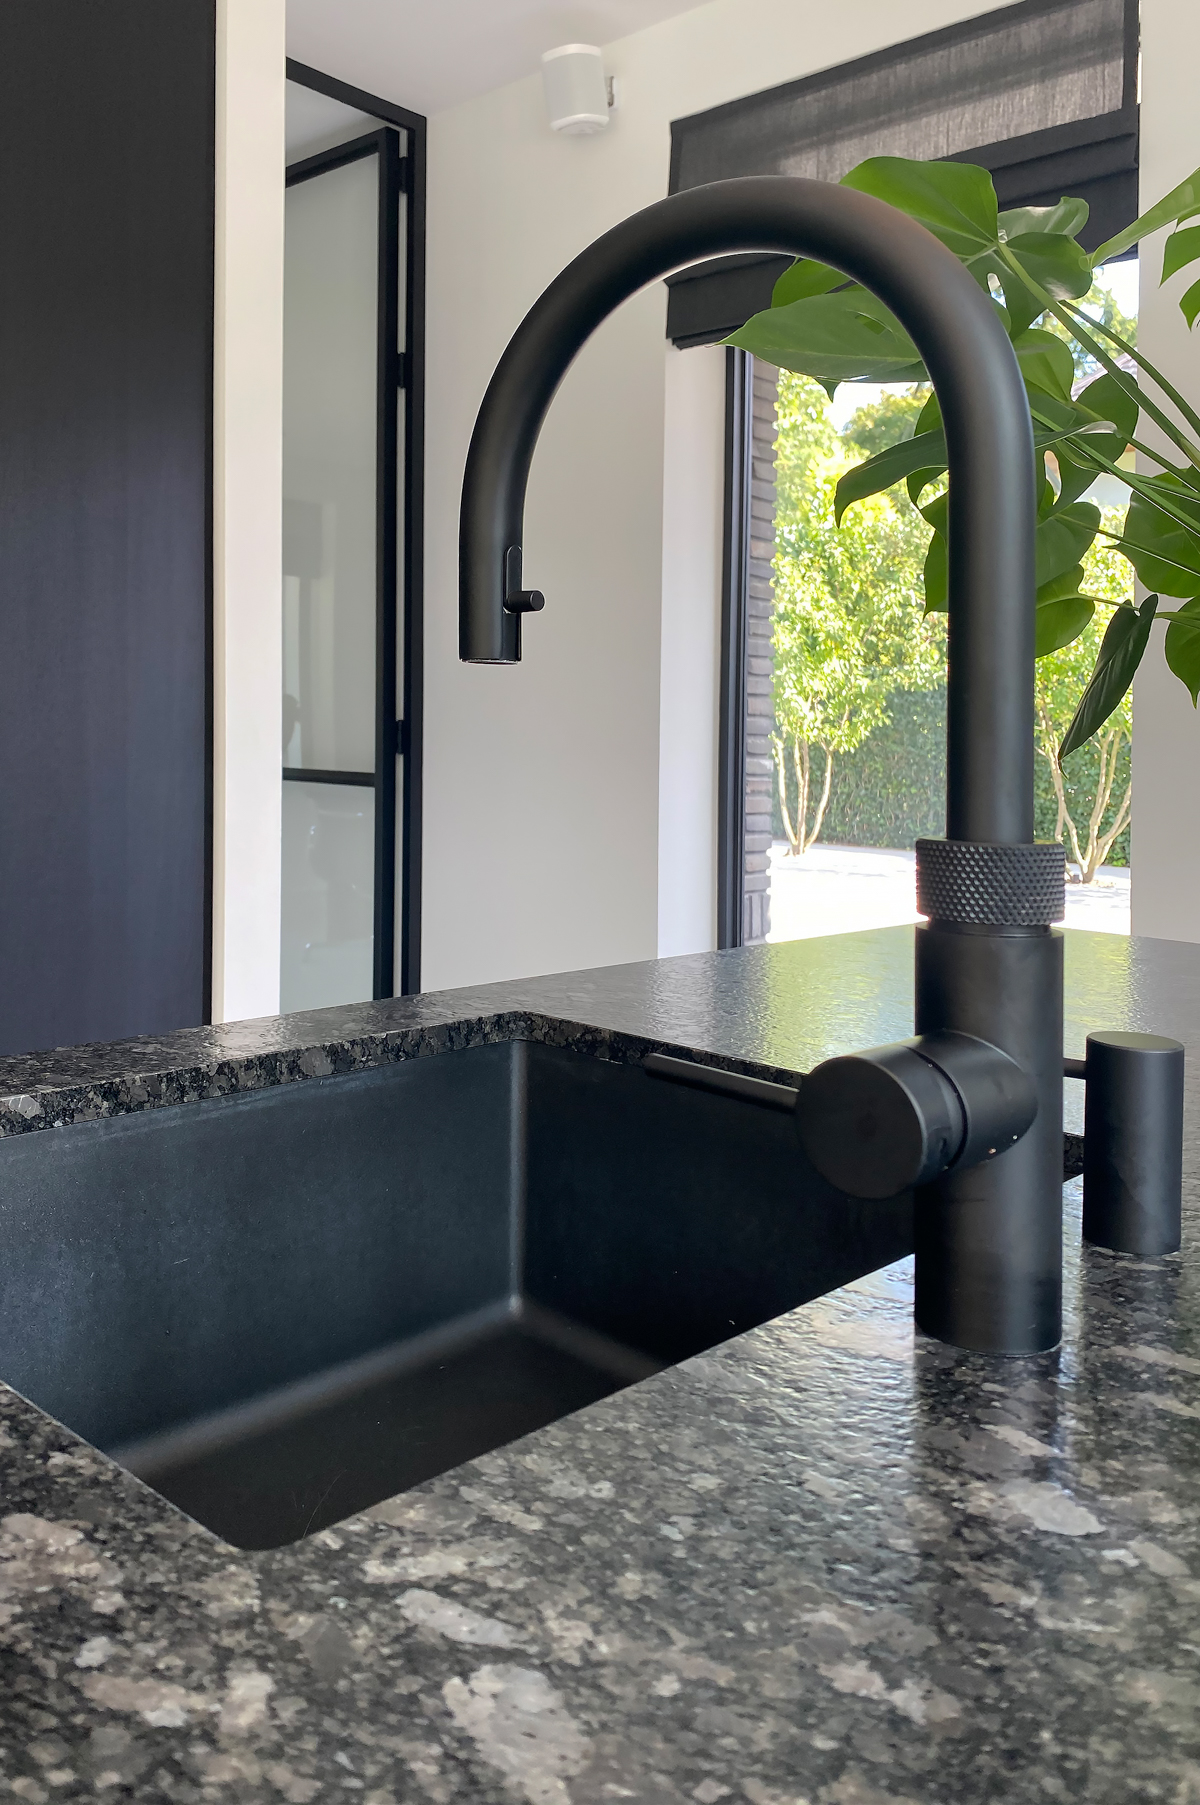 Modern herenhuis met aansprekende architectuur (25)